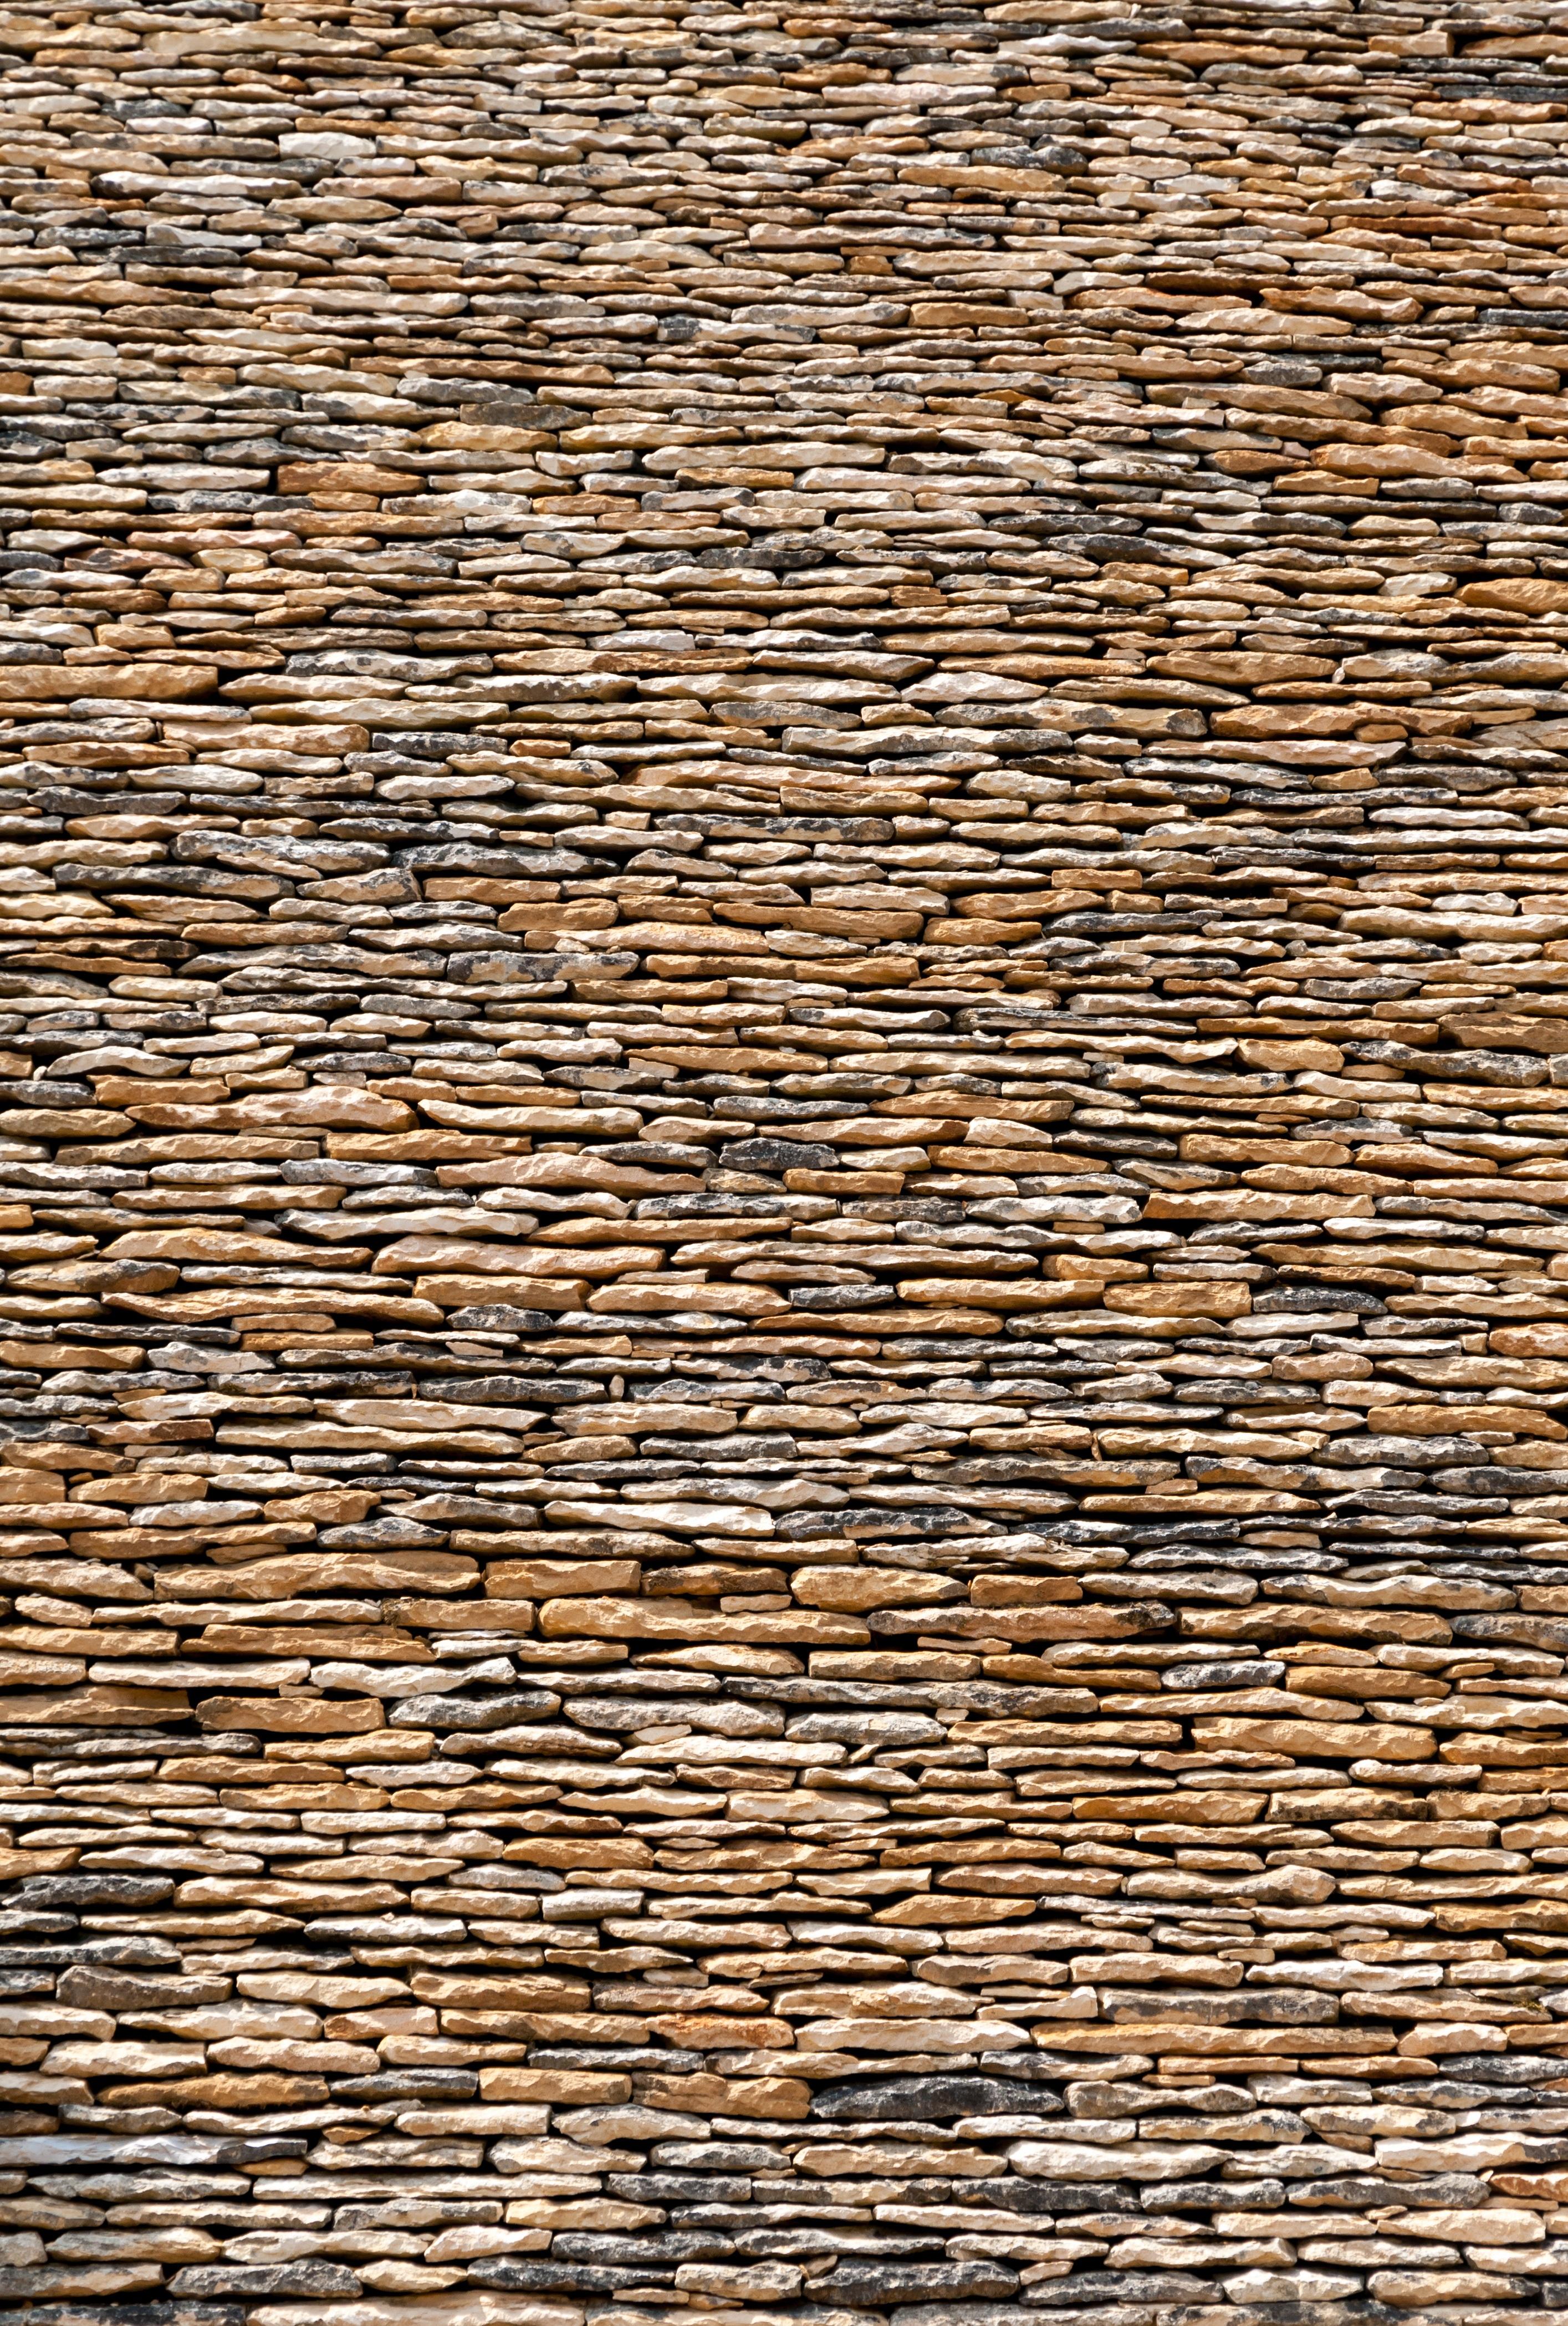 Free wood texture floor building cobblestone soil